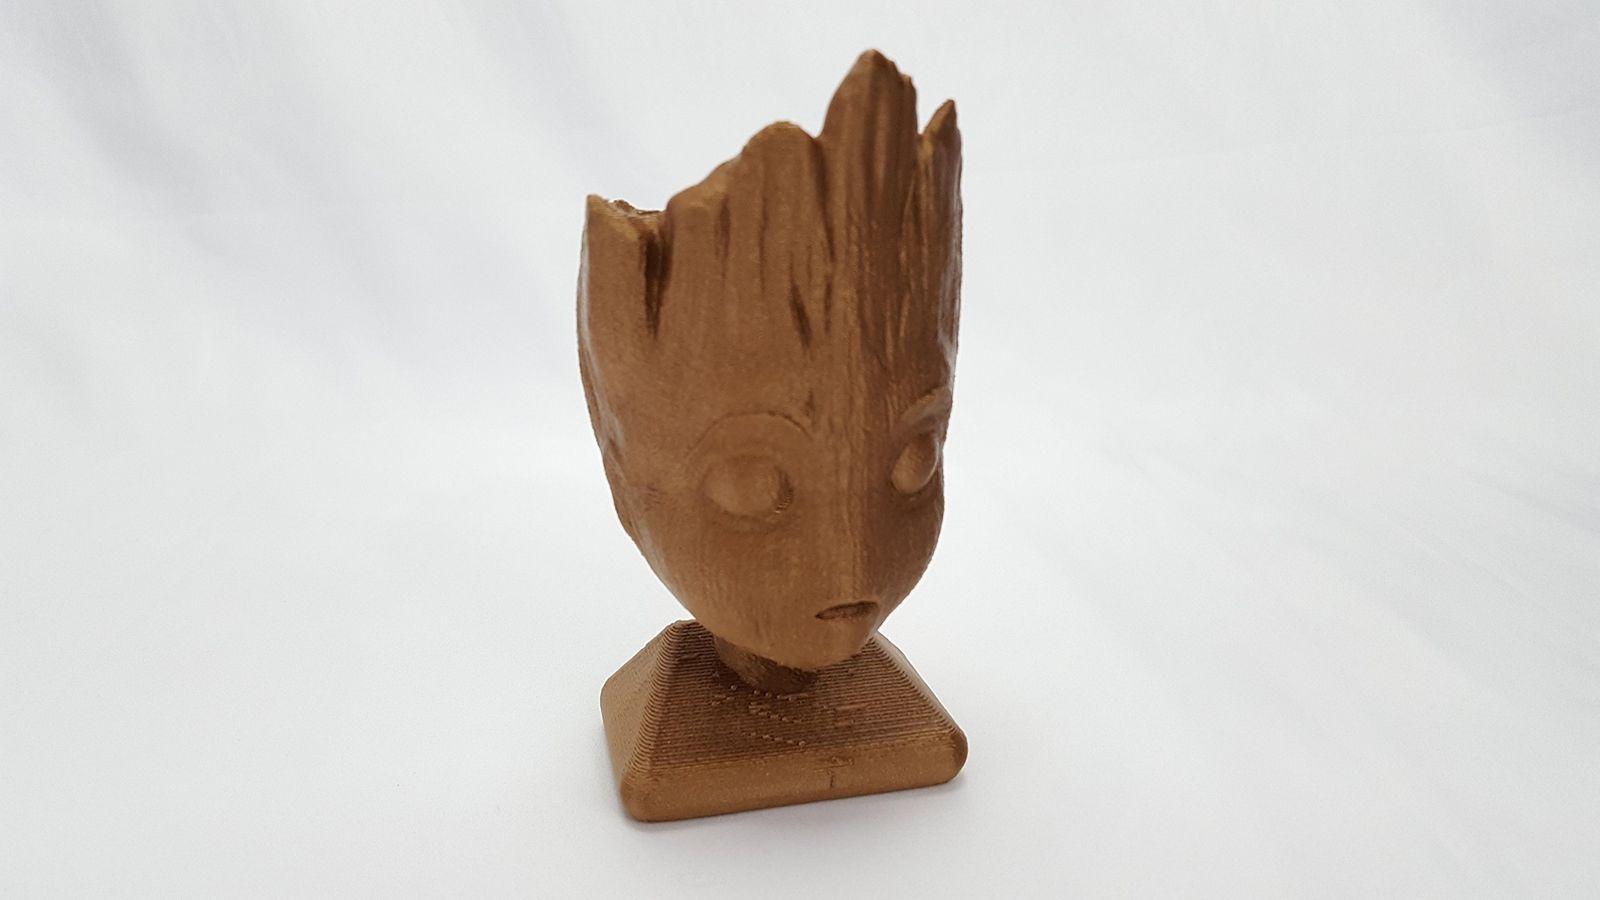 3D Printed Planter Pots by 3D Cauldron (Baby Tree Planter) Baby Tree Planter